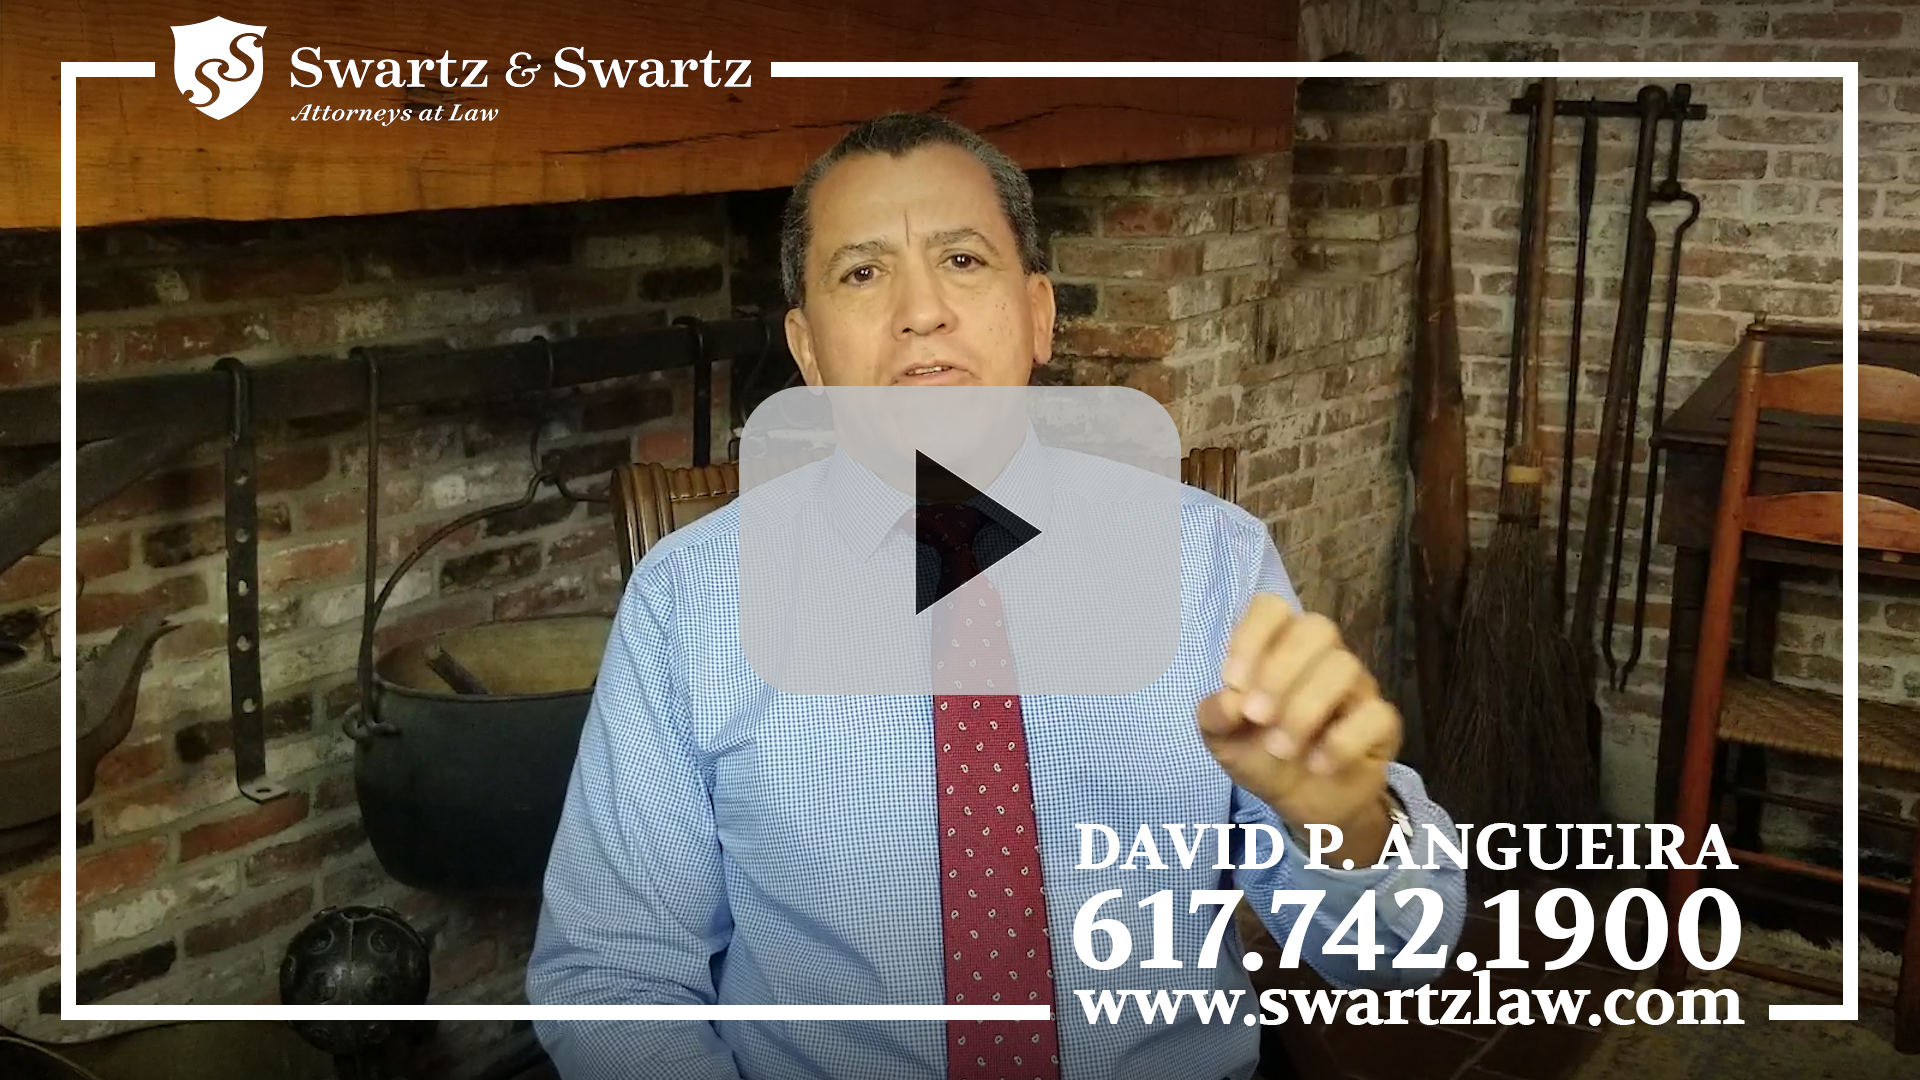 David Angueira – Discusses Whistleblower Claims